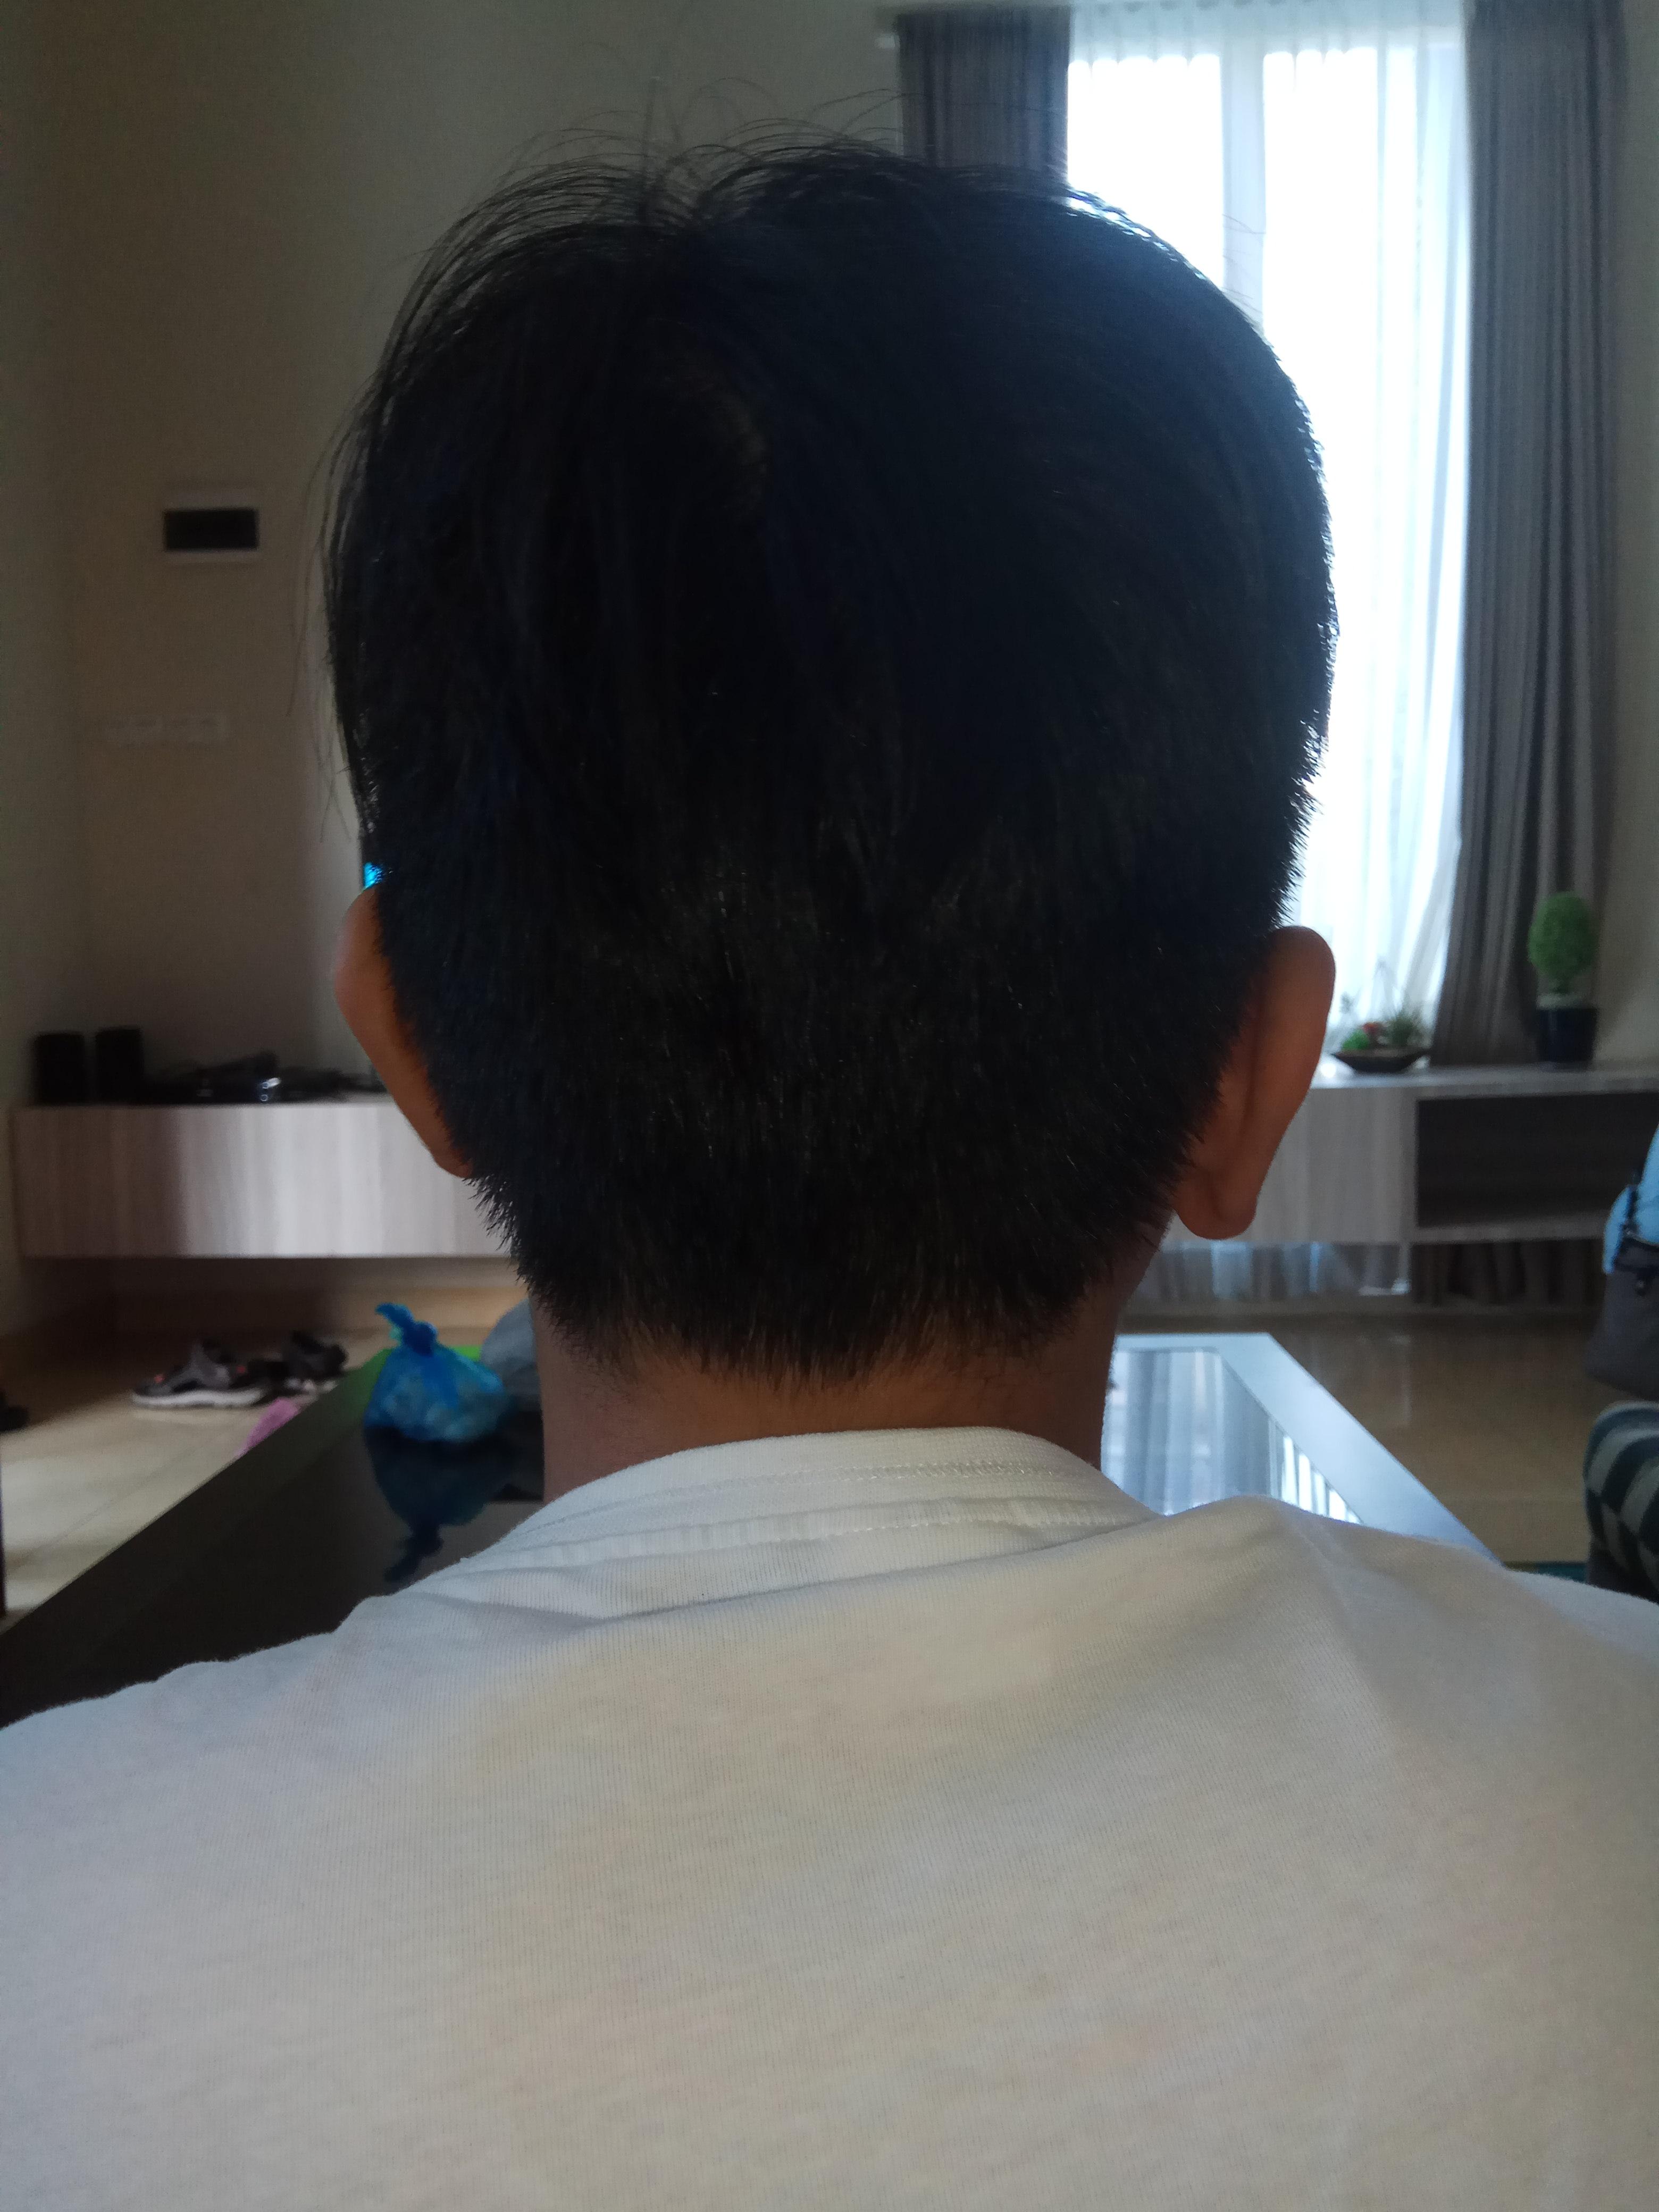 FileBoy with short black hair, rear view 18 September 18.jpg ...